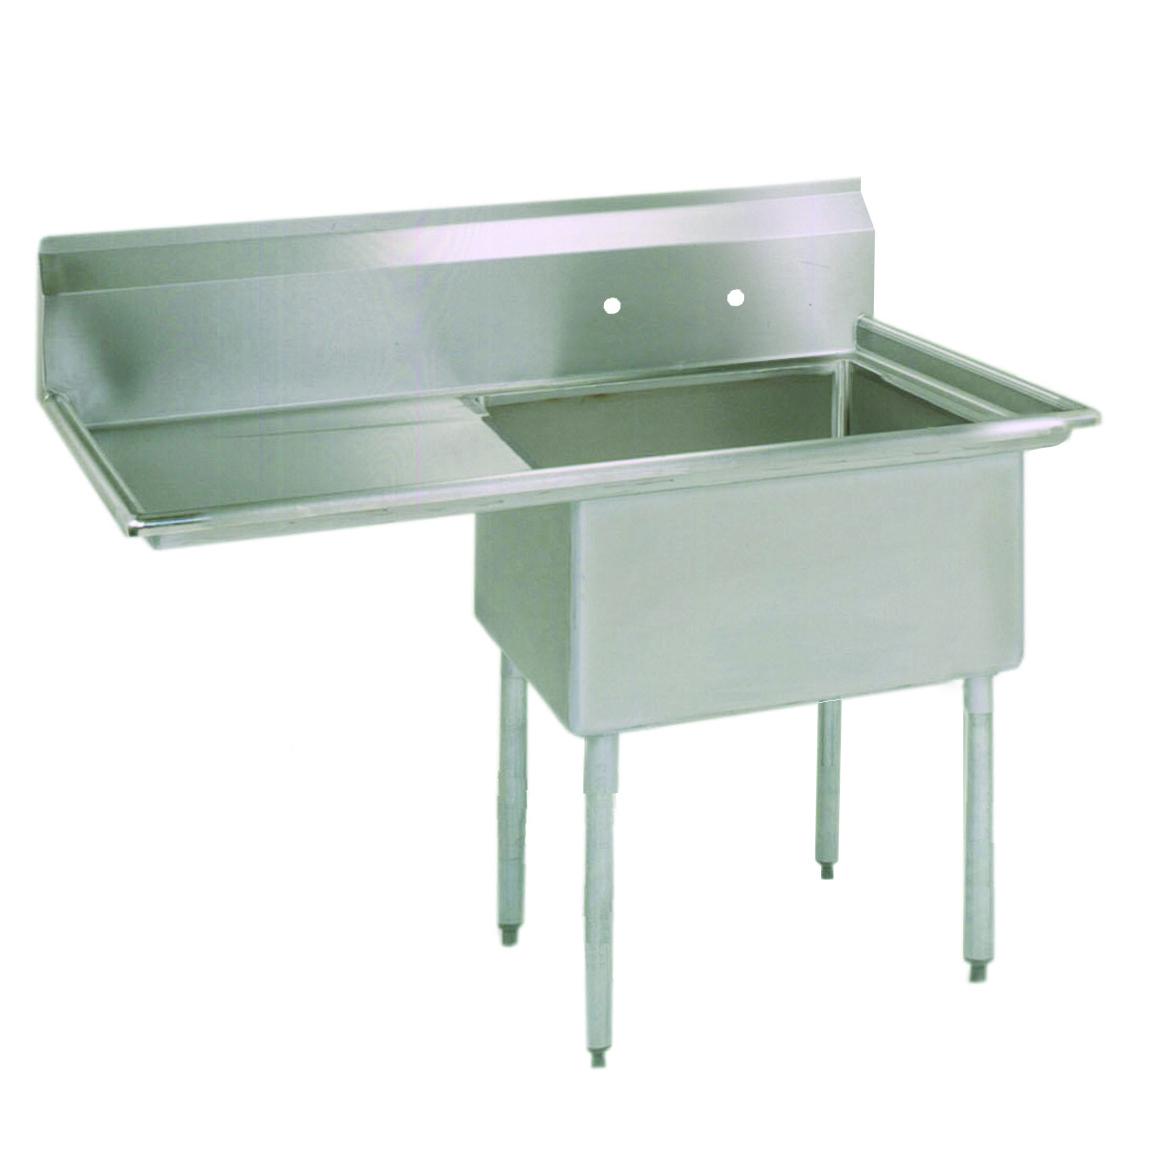 BK Resources ES-1-18-12-18L sink, (1) one compartment